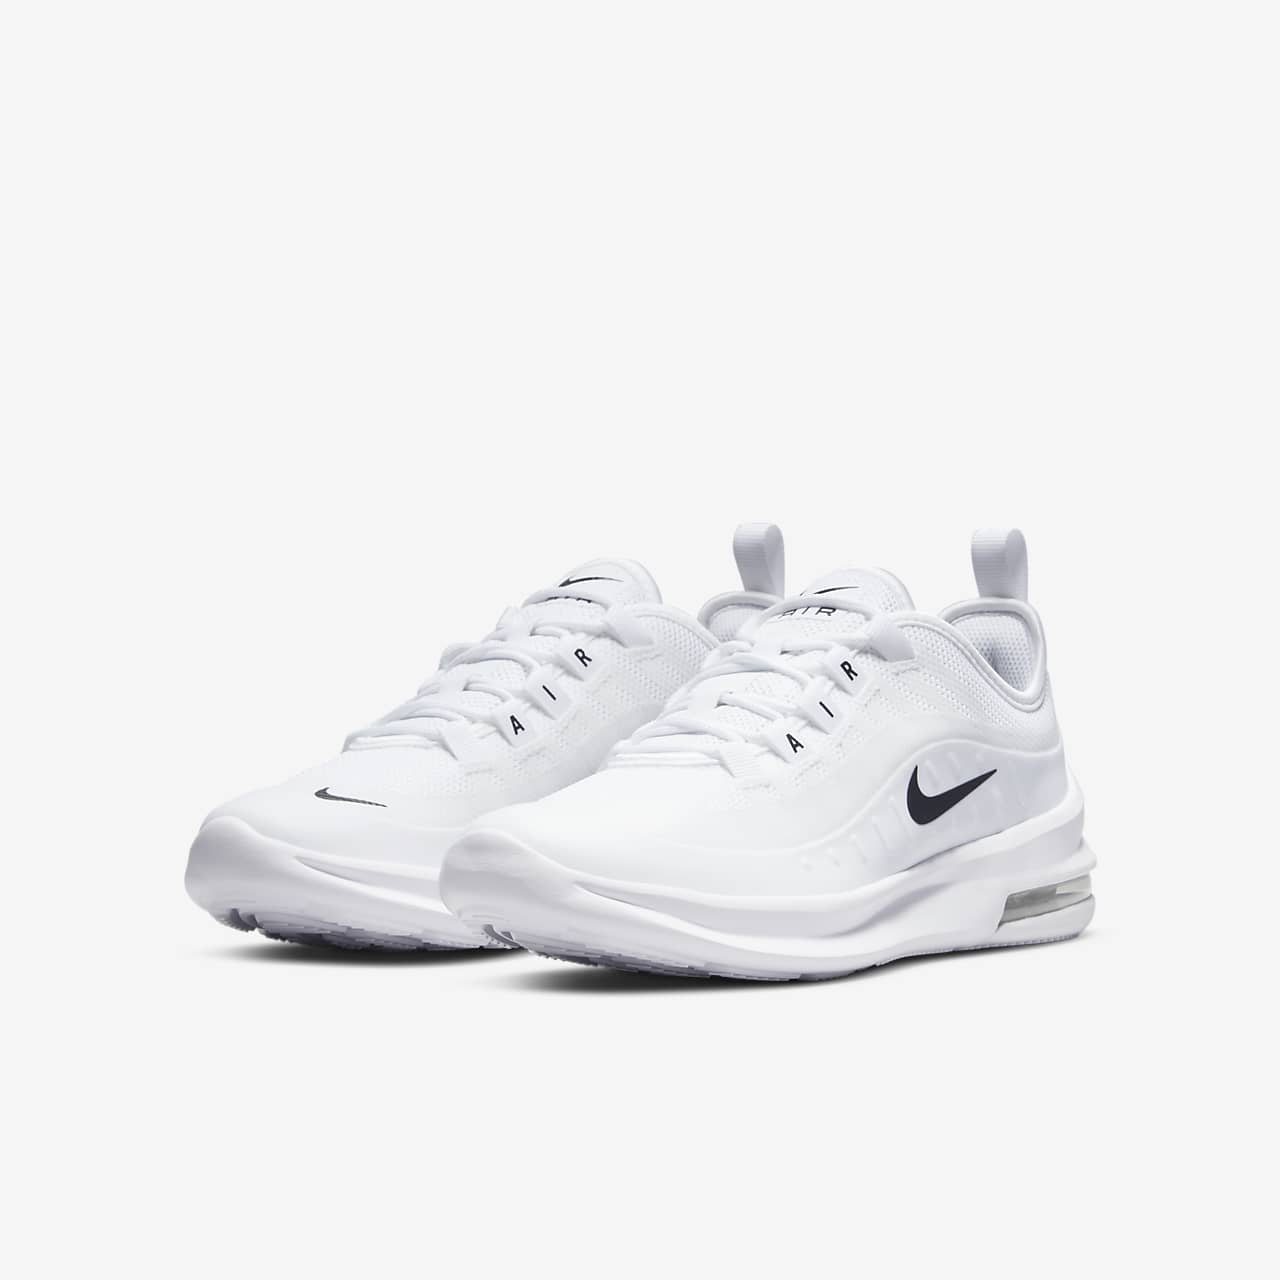 Nike Sneakers Axe Air Max Esprit B9Qz2xg7W